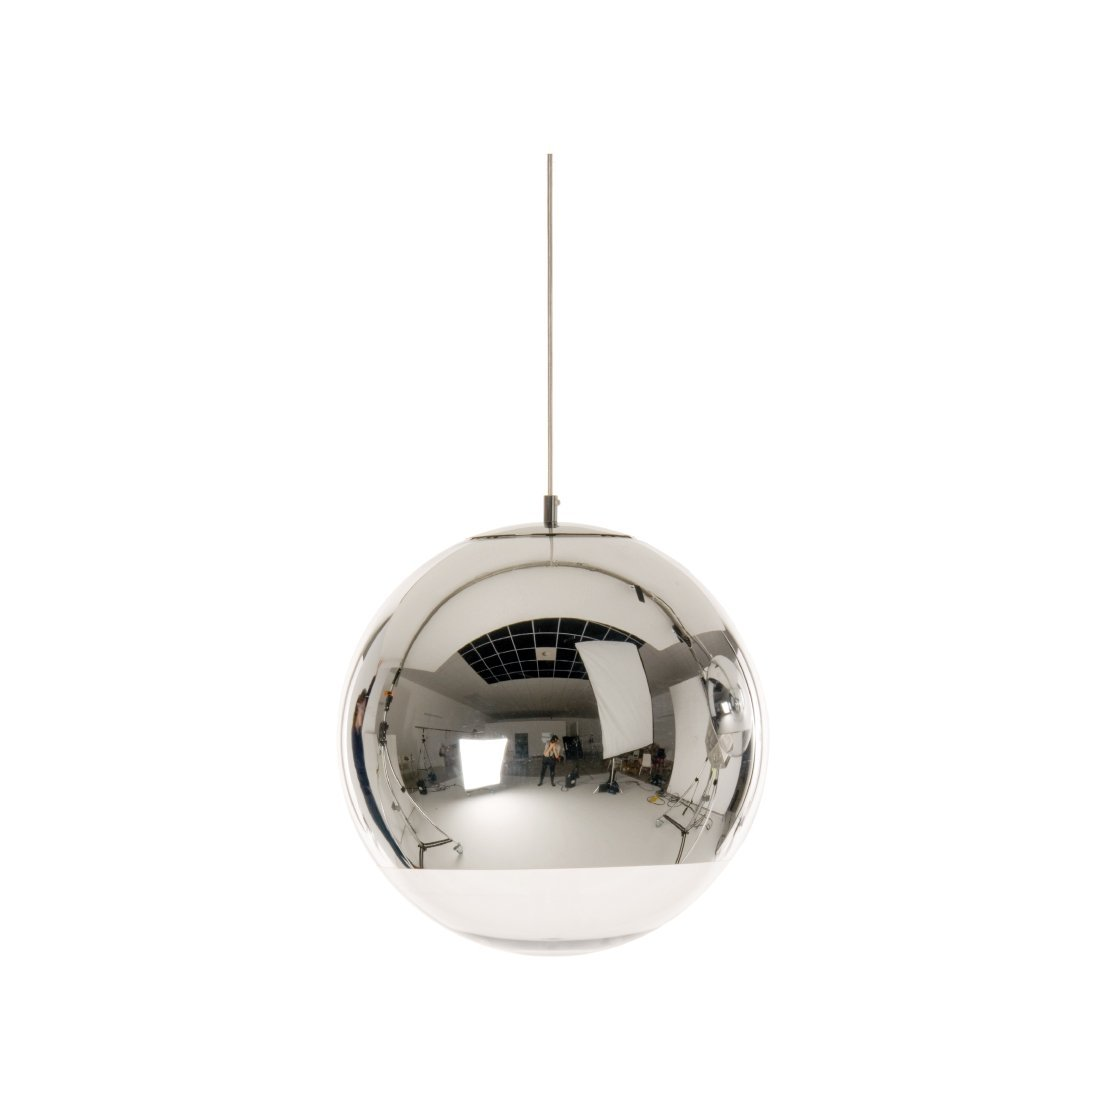 Tom Dixon Mirror Ball Hanglamp � 25 cm